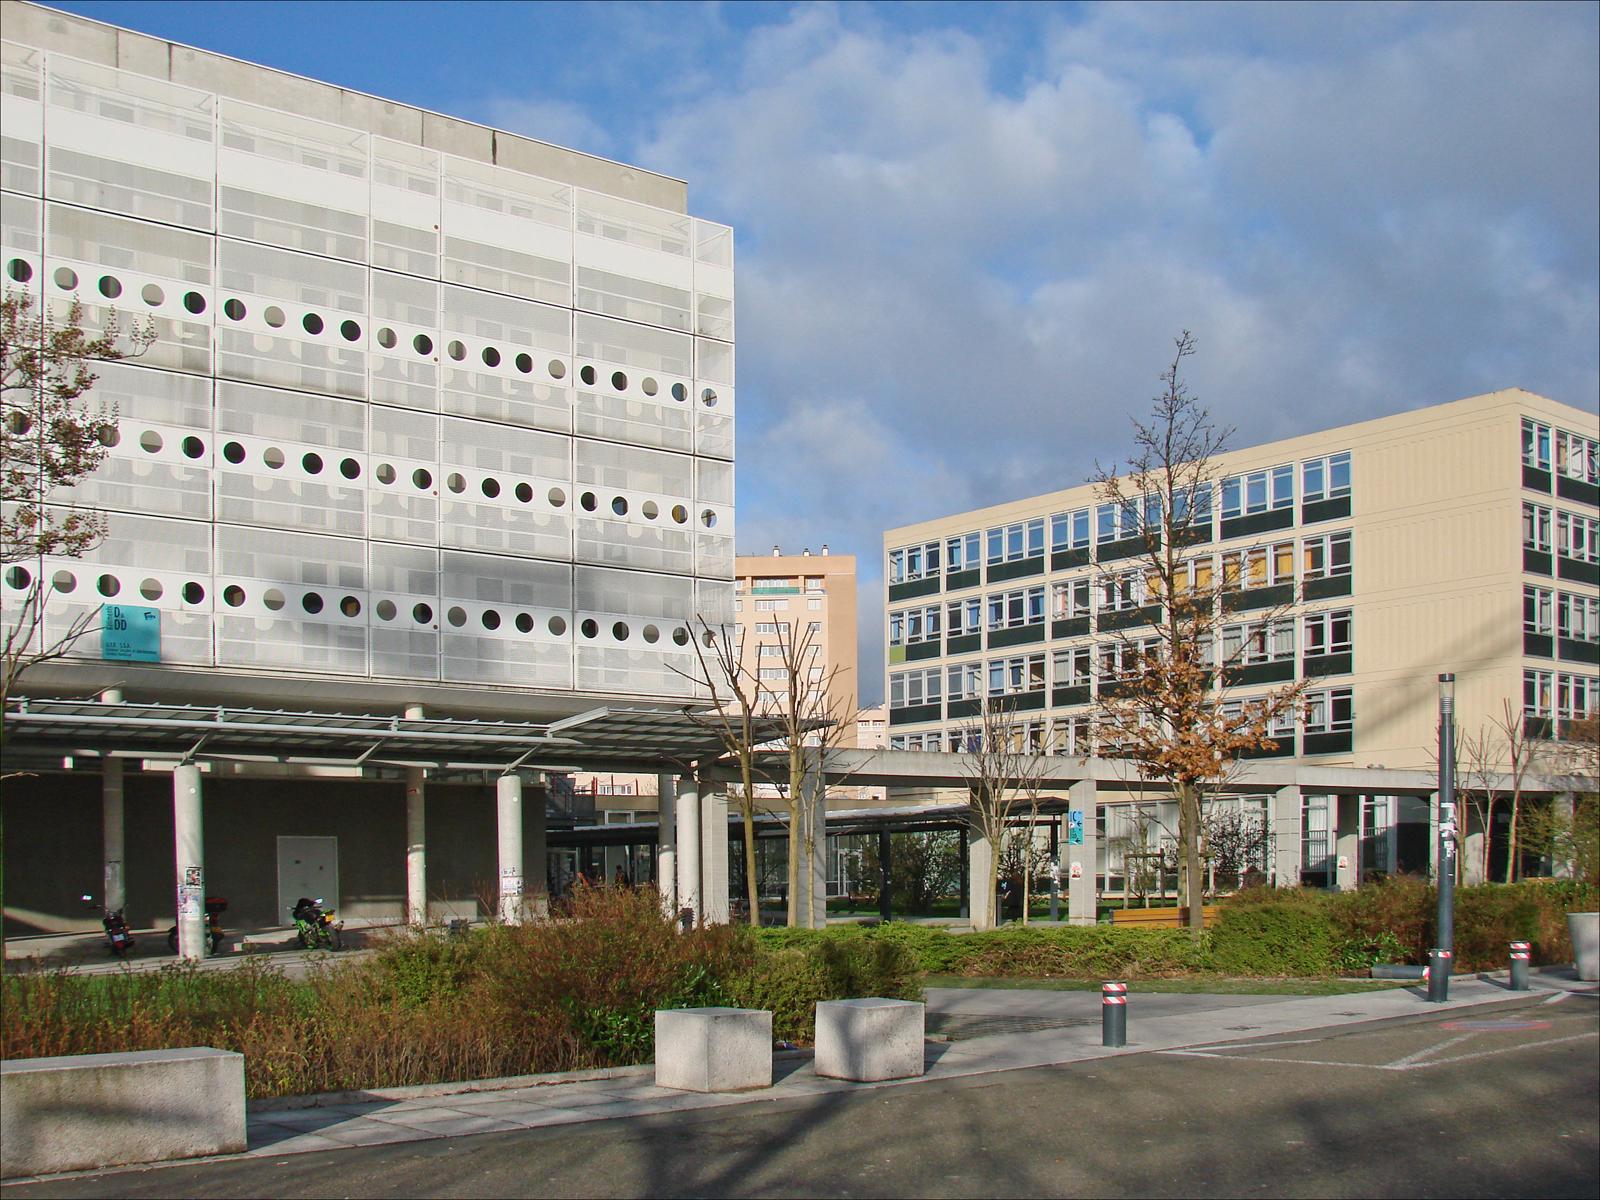 Universität paris nanterre u wikipedia